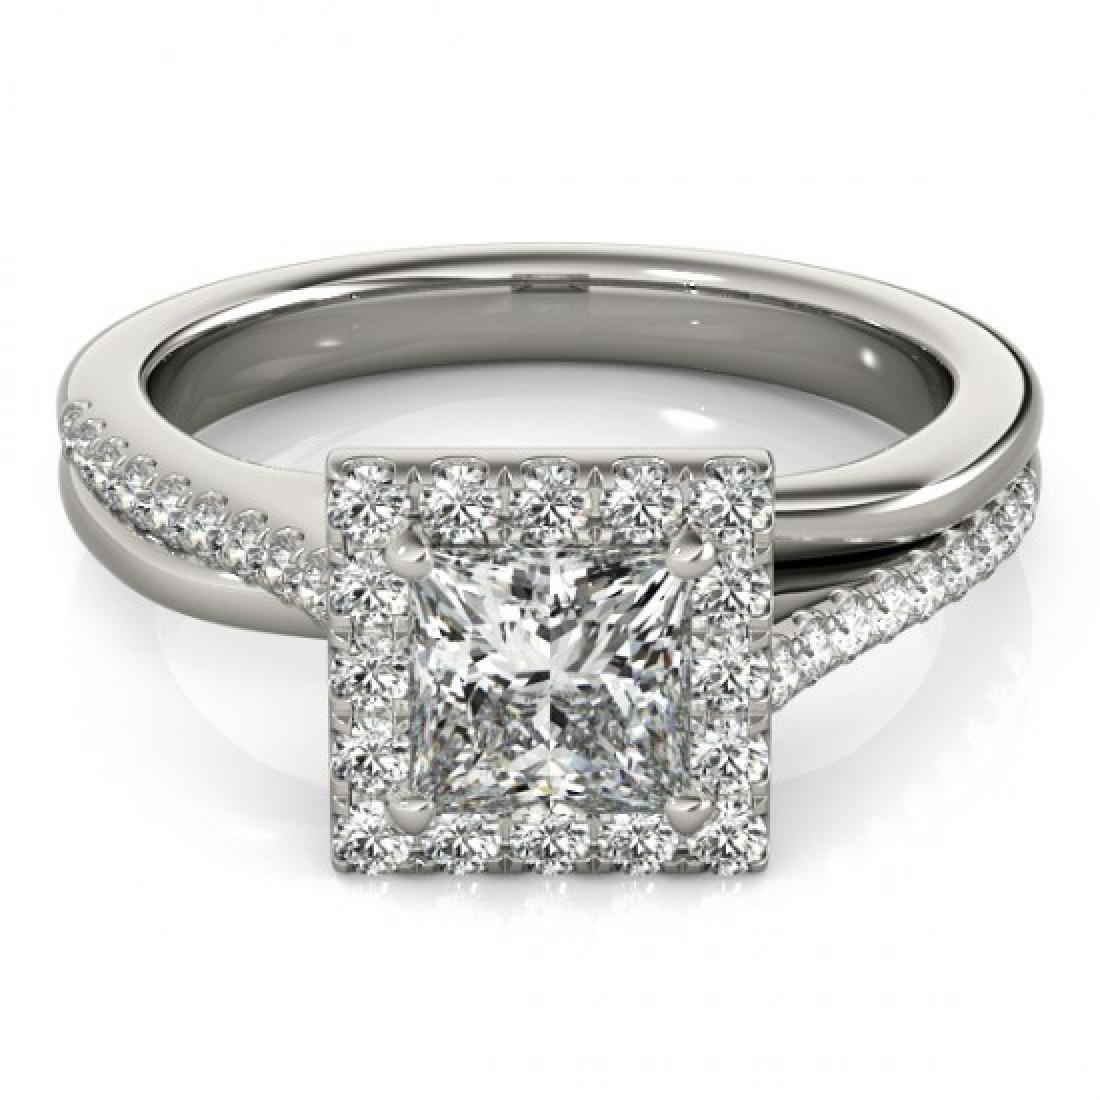 1.25 CTW Certified VS/SI Princess Diamond Solitaire